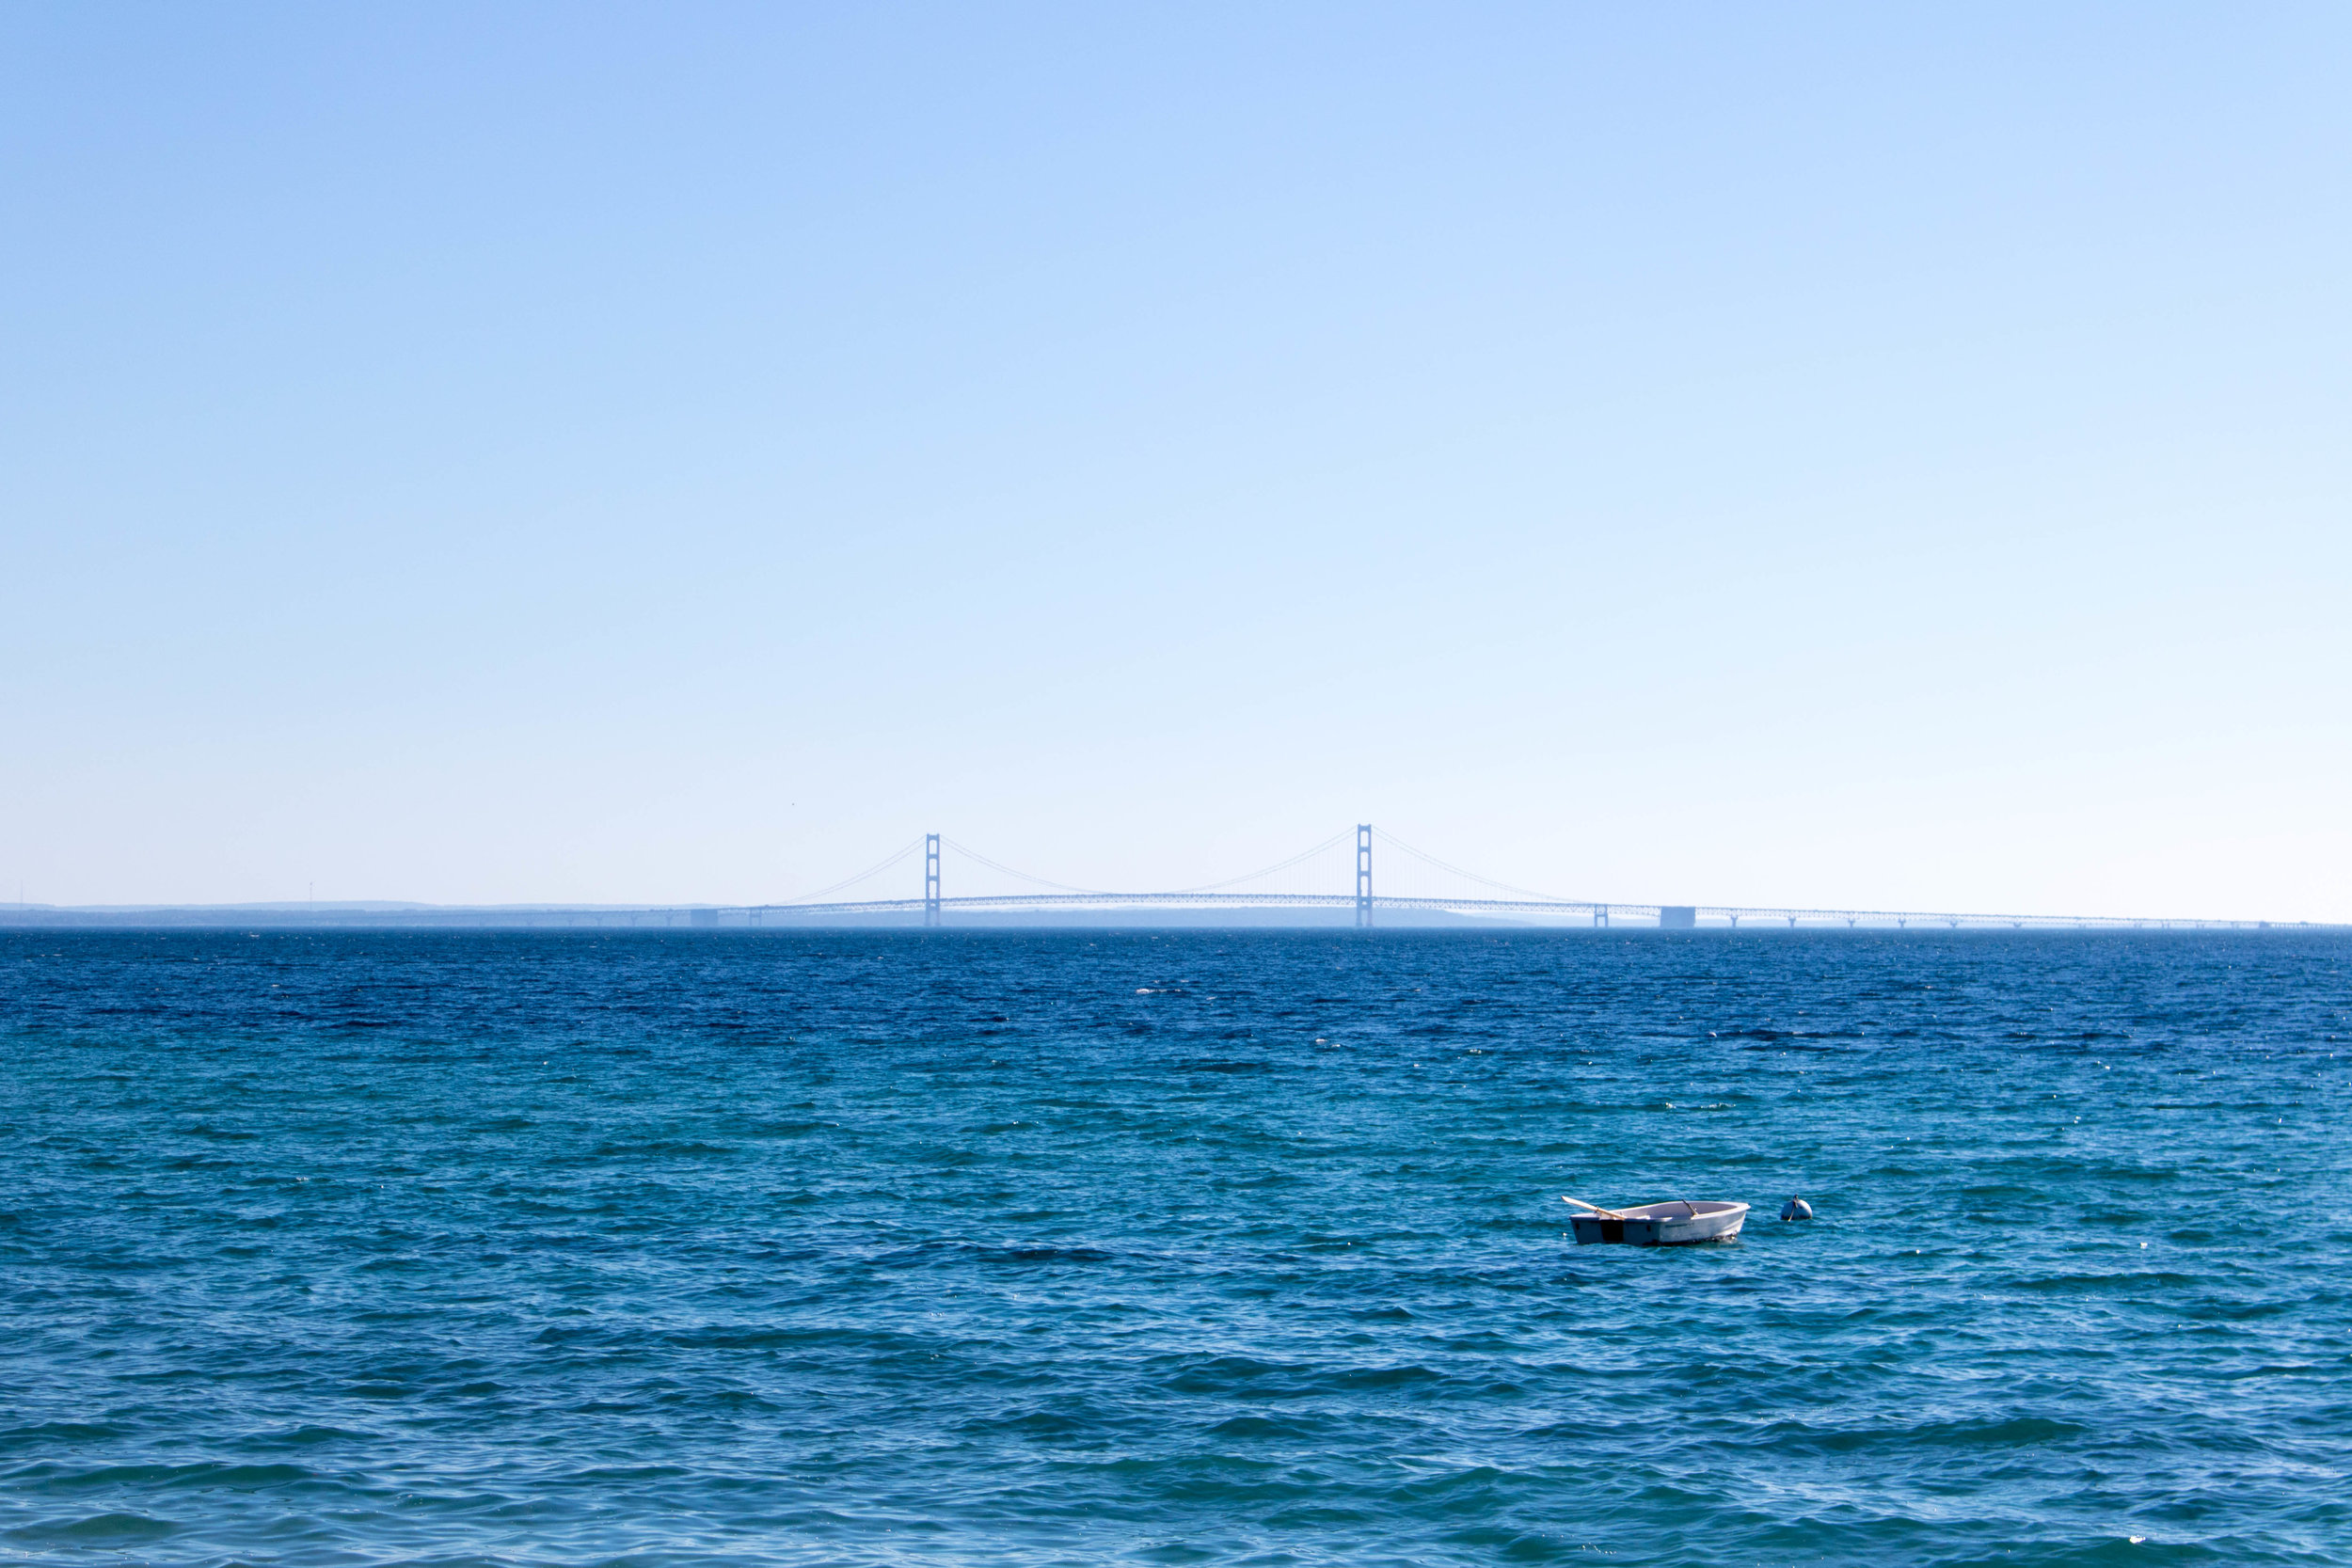 Row-Boat-Mackinac-Bridge-Mackinac-Island-Michigan-Photography